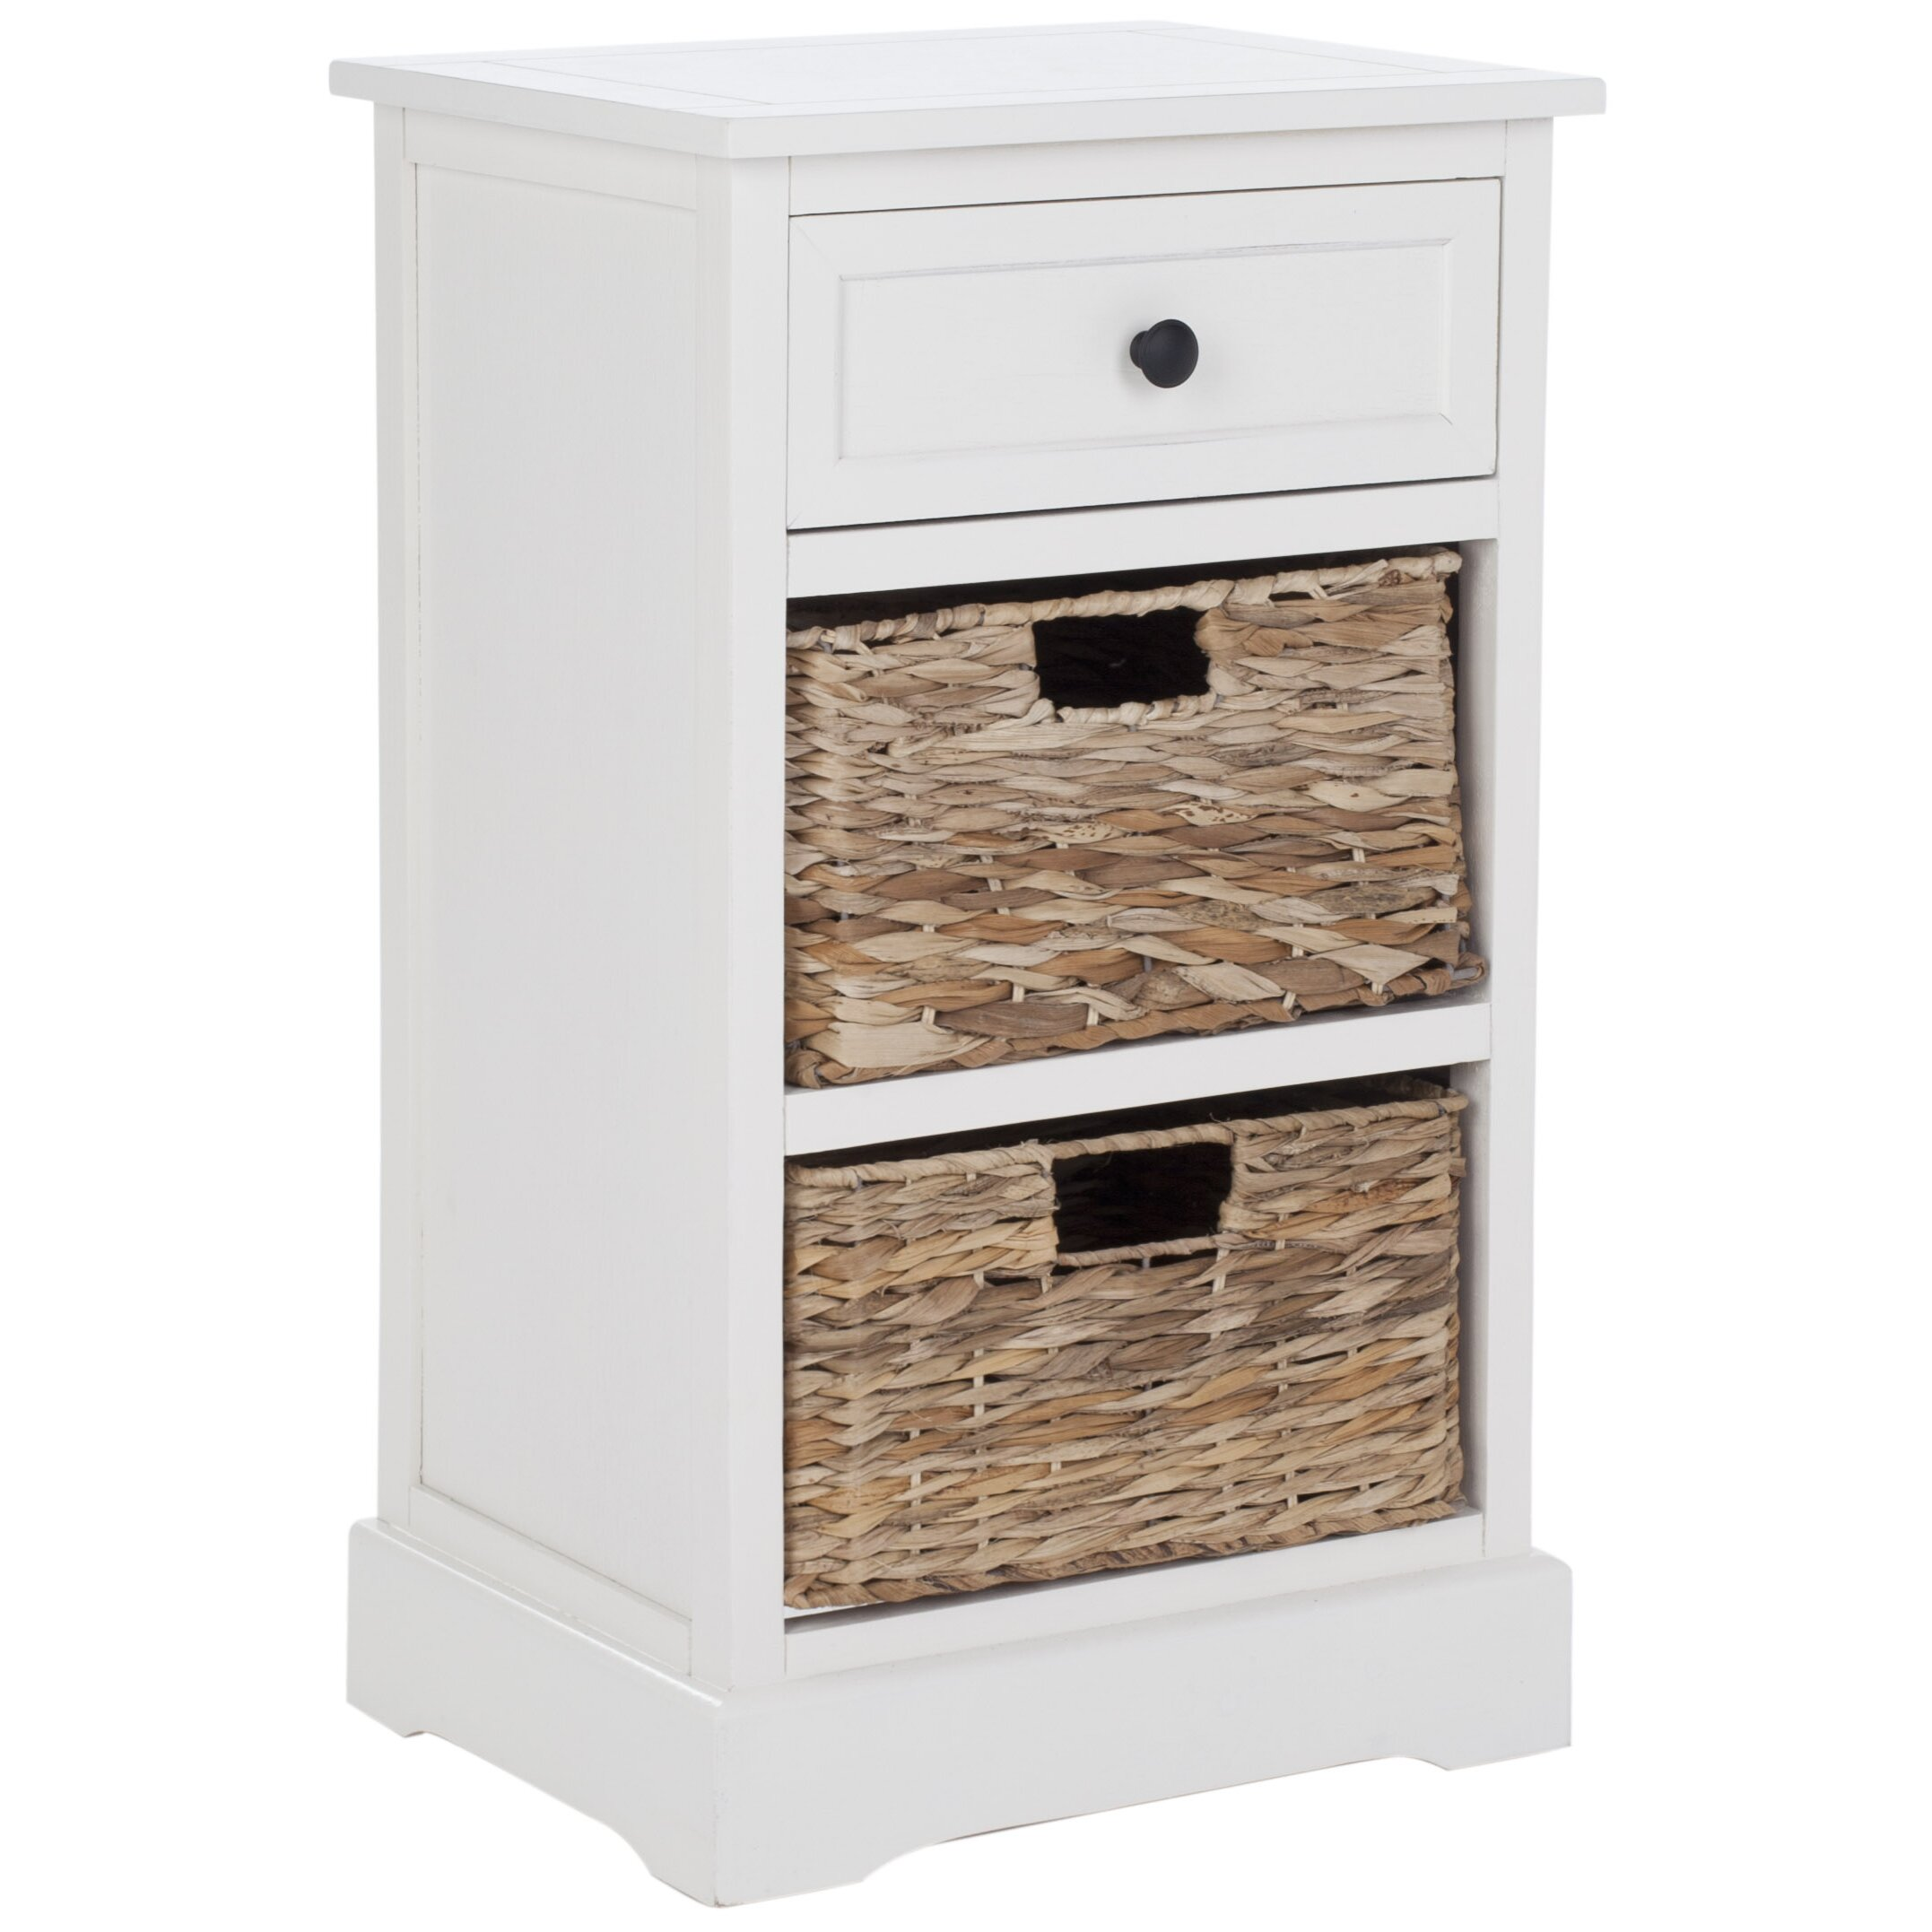 Safavieh juneau 1 drawer bedside table reviews wayfair uk for 1 drawer bedside table